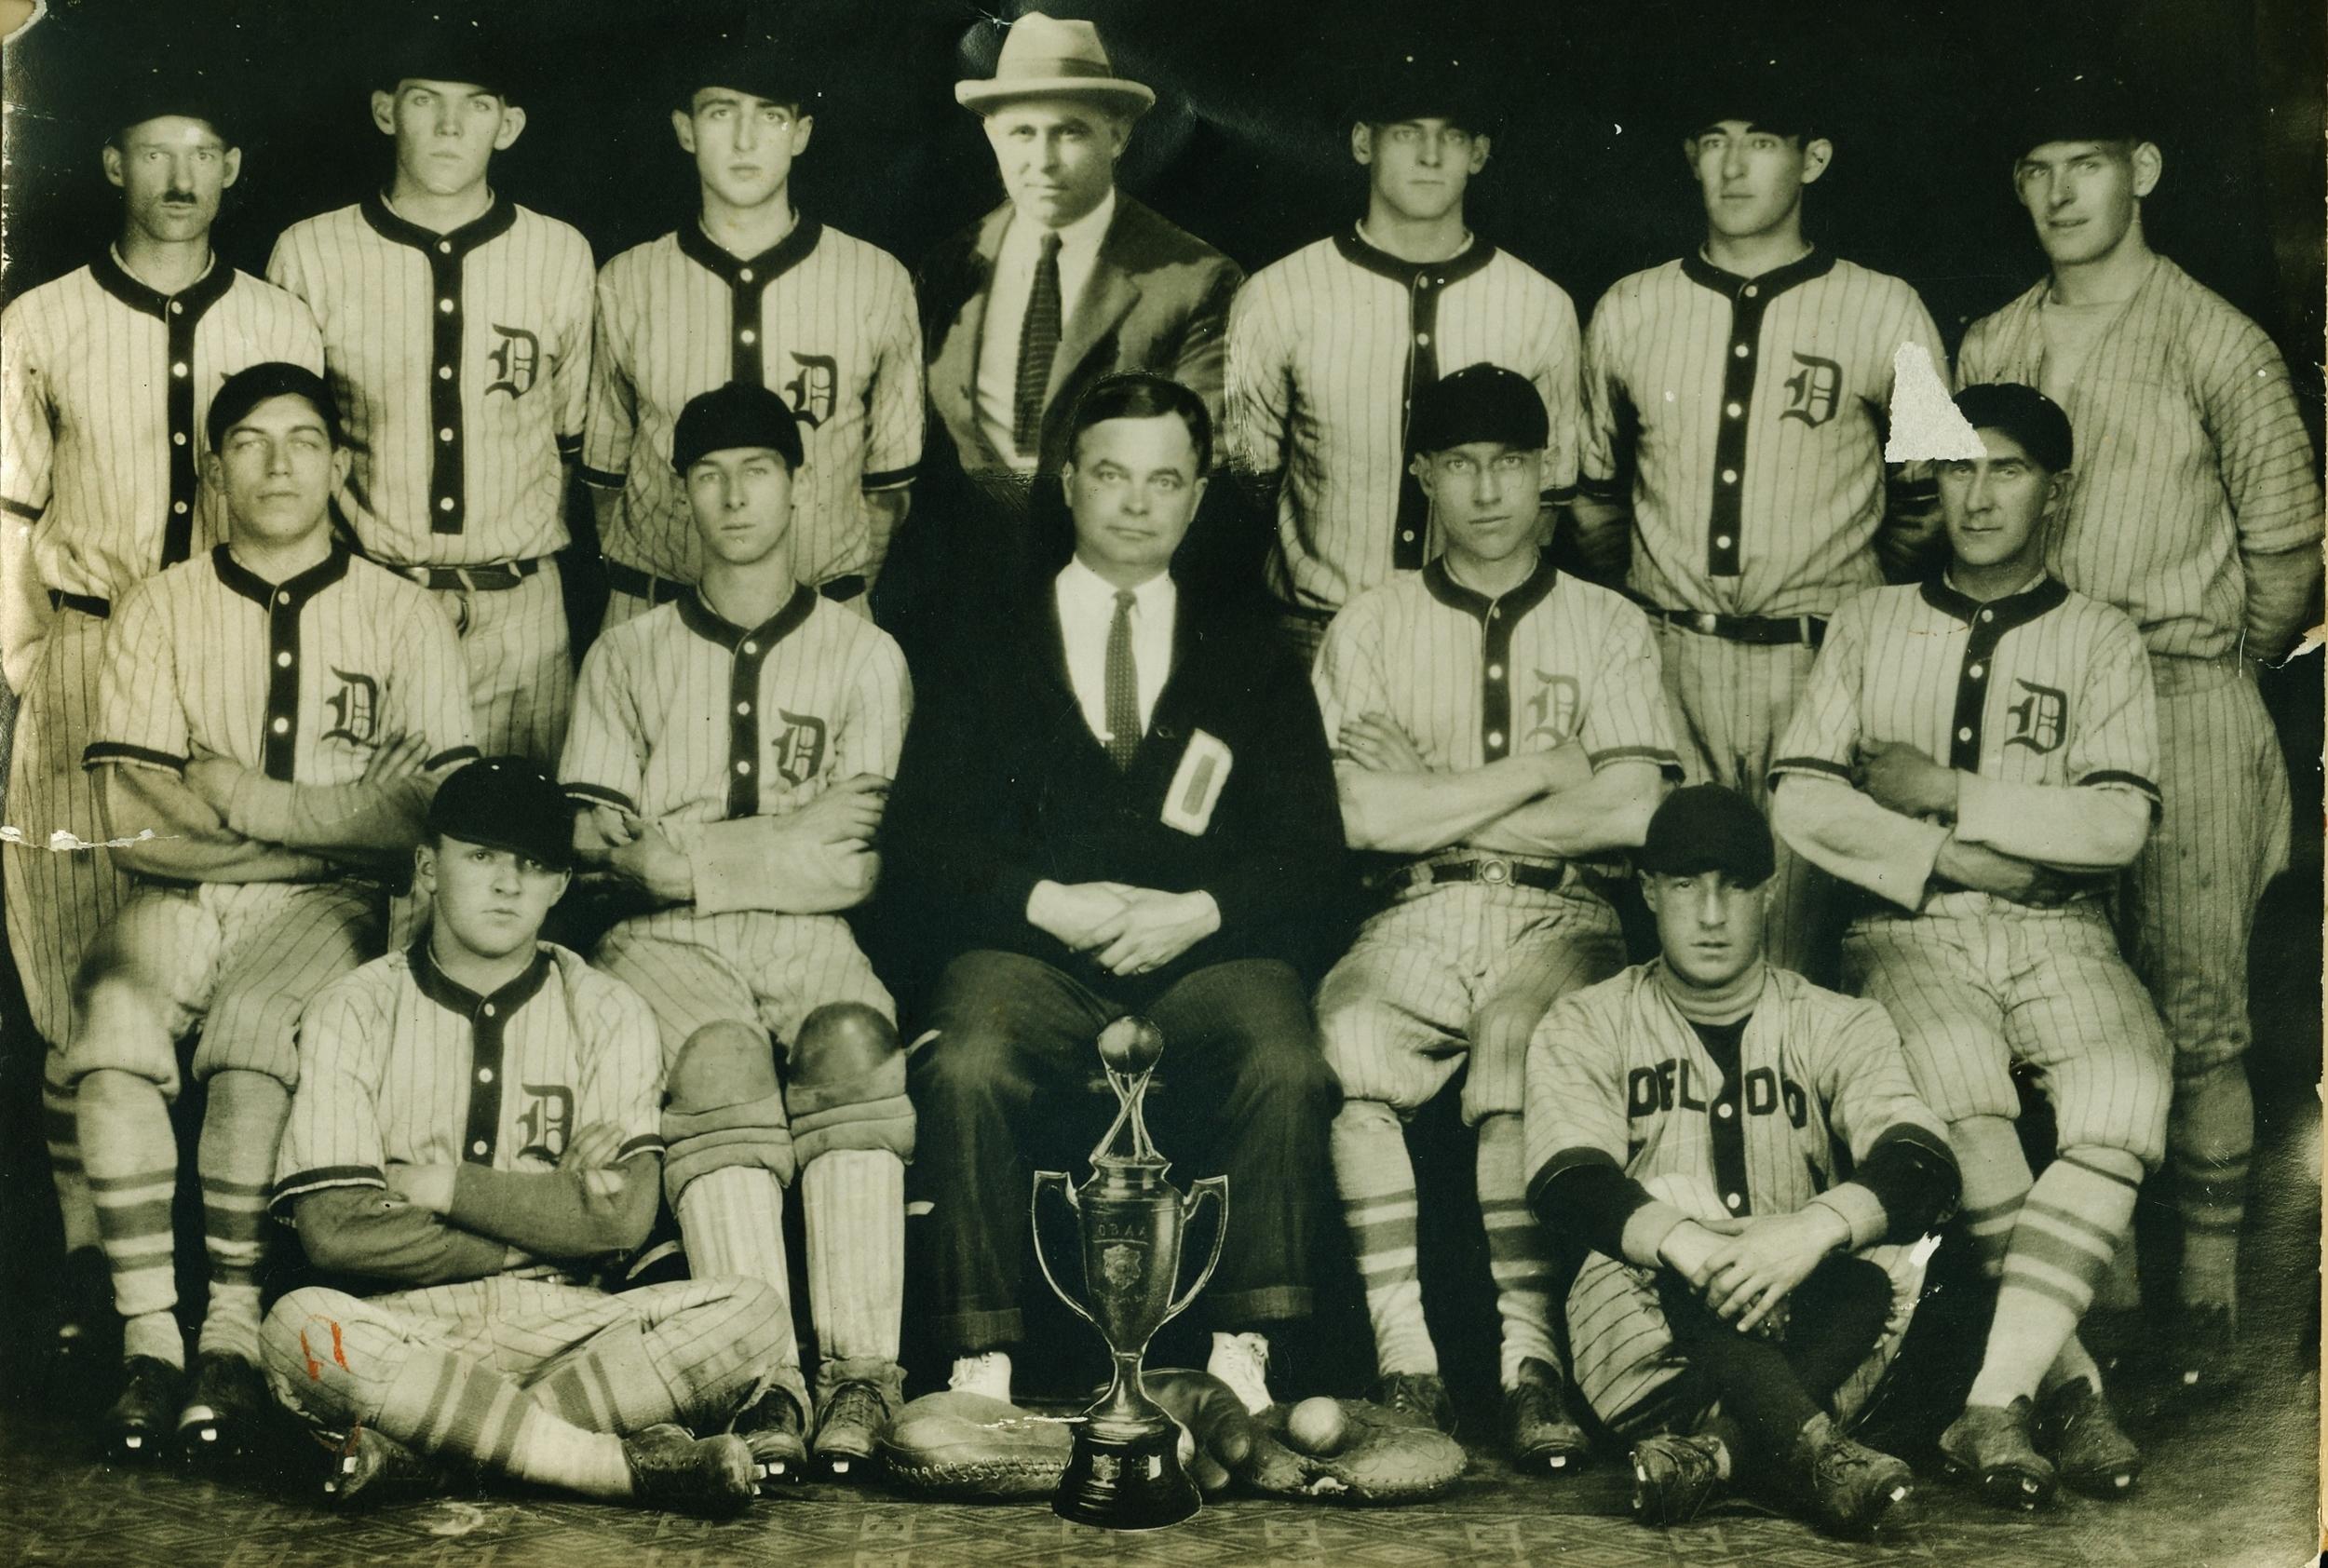 1926 Deloro Baseball Club Intermediate Champions O.B.A.A